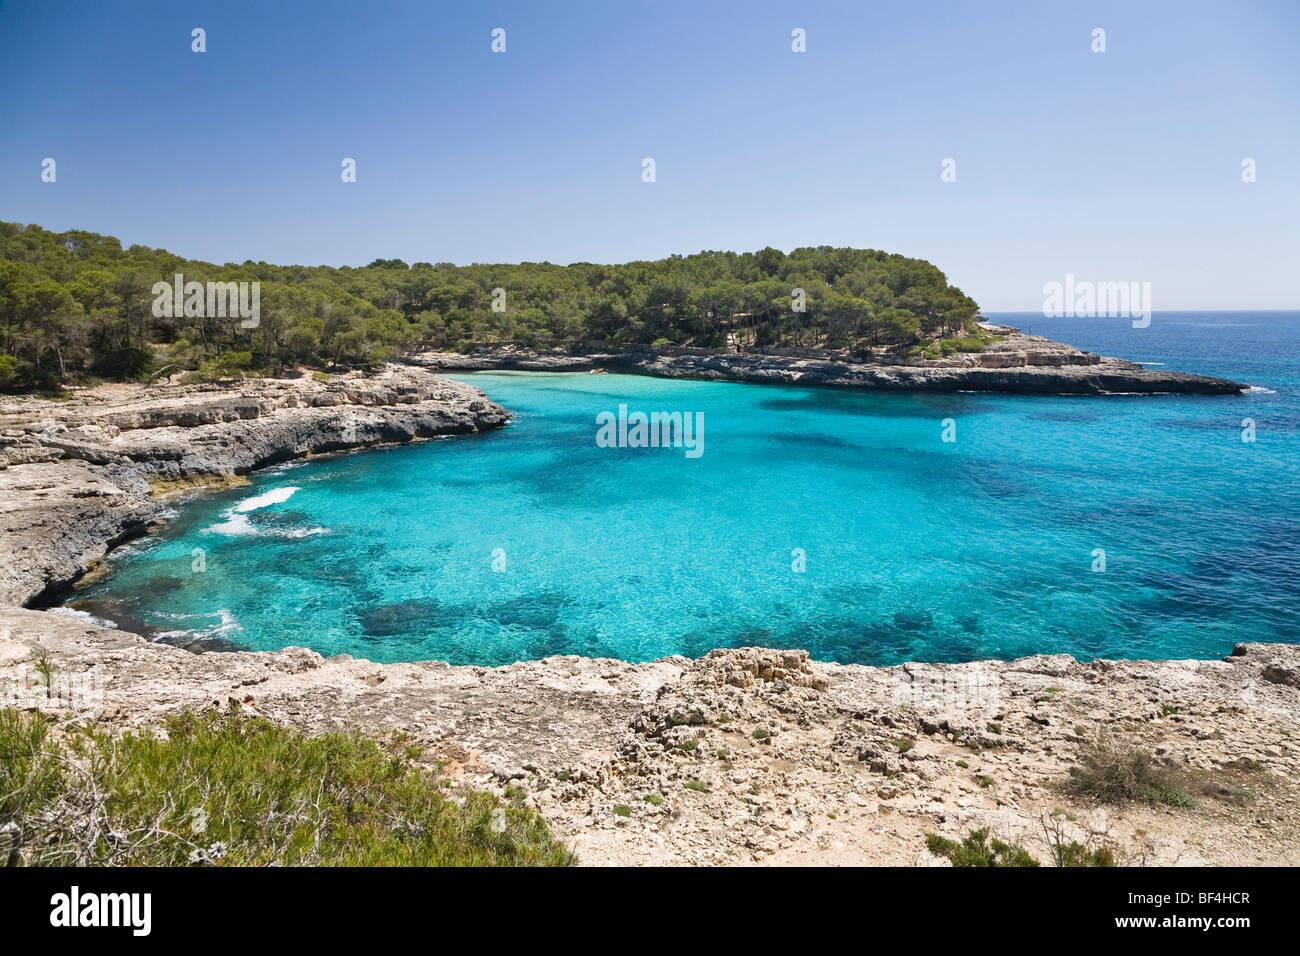 Caló des Burgit in the Cala Mondragó bay, natural park of Mondragó, Mallorca, Majorca, Balearic Islands, - Stock Image